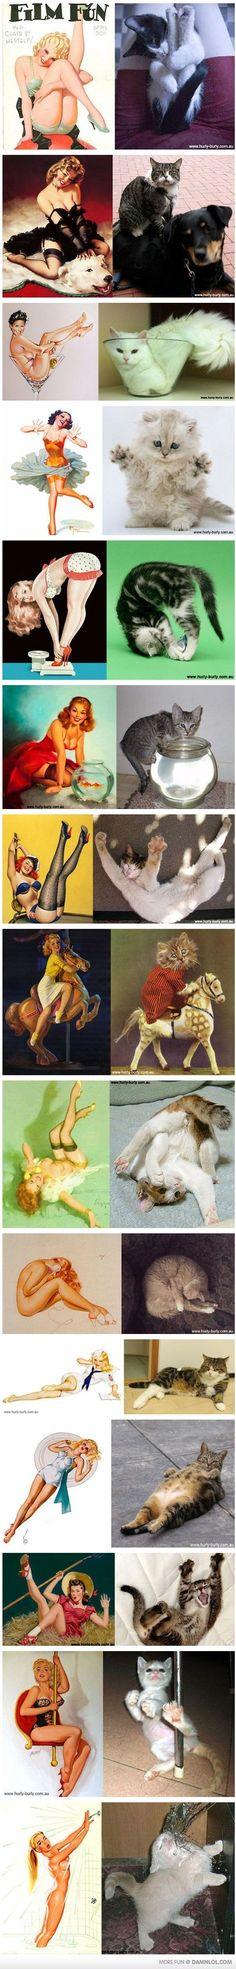 Pin-Up Cats